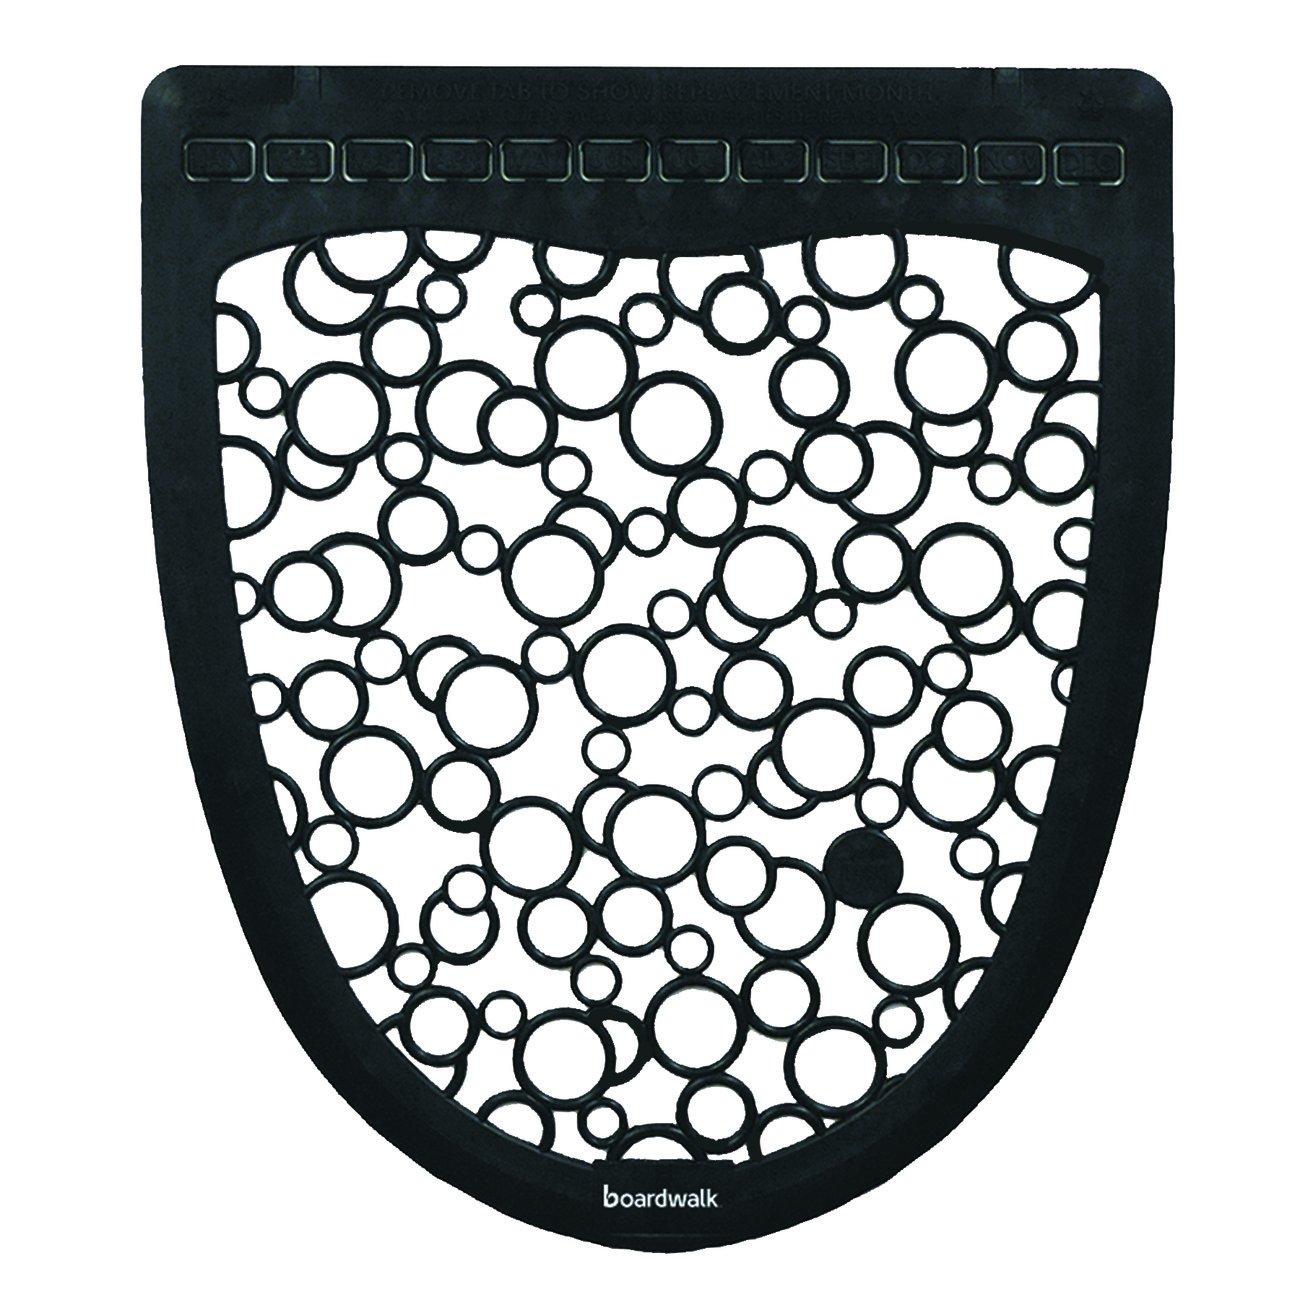 Boardwalk UMBW Urinal Mat Super sale 2.0 Rubber 17 20 C White SEAL limited product 6 x 1 Black